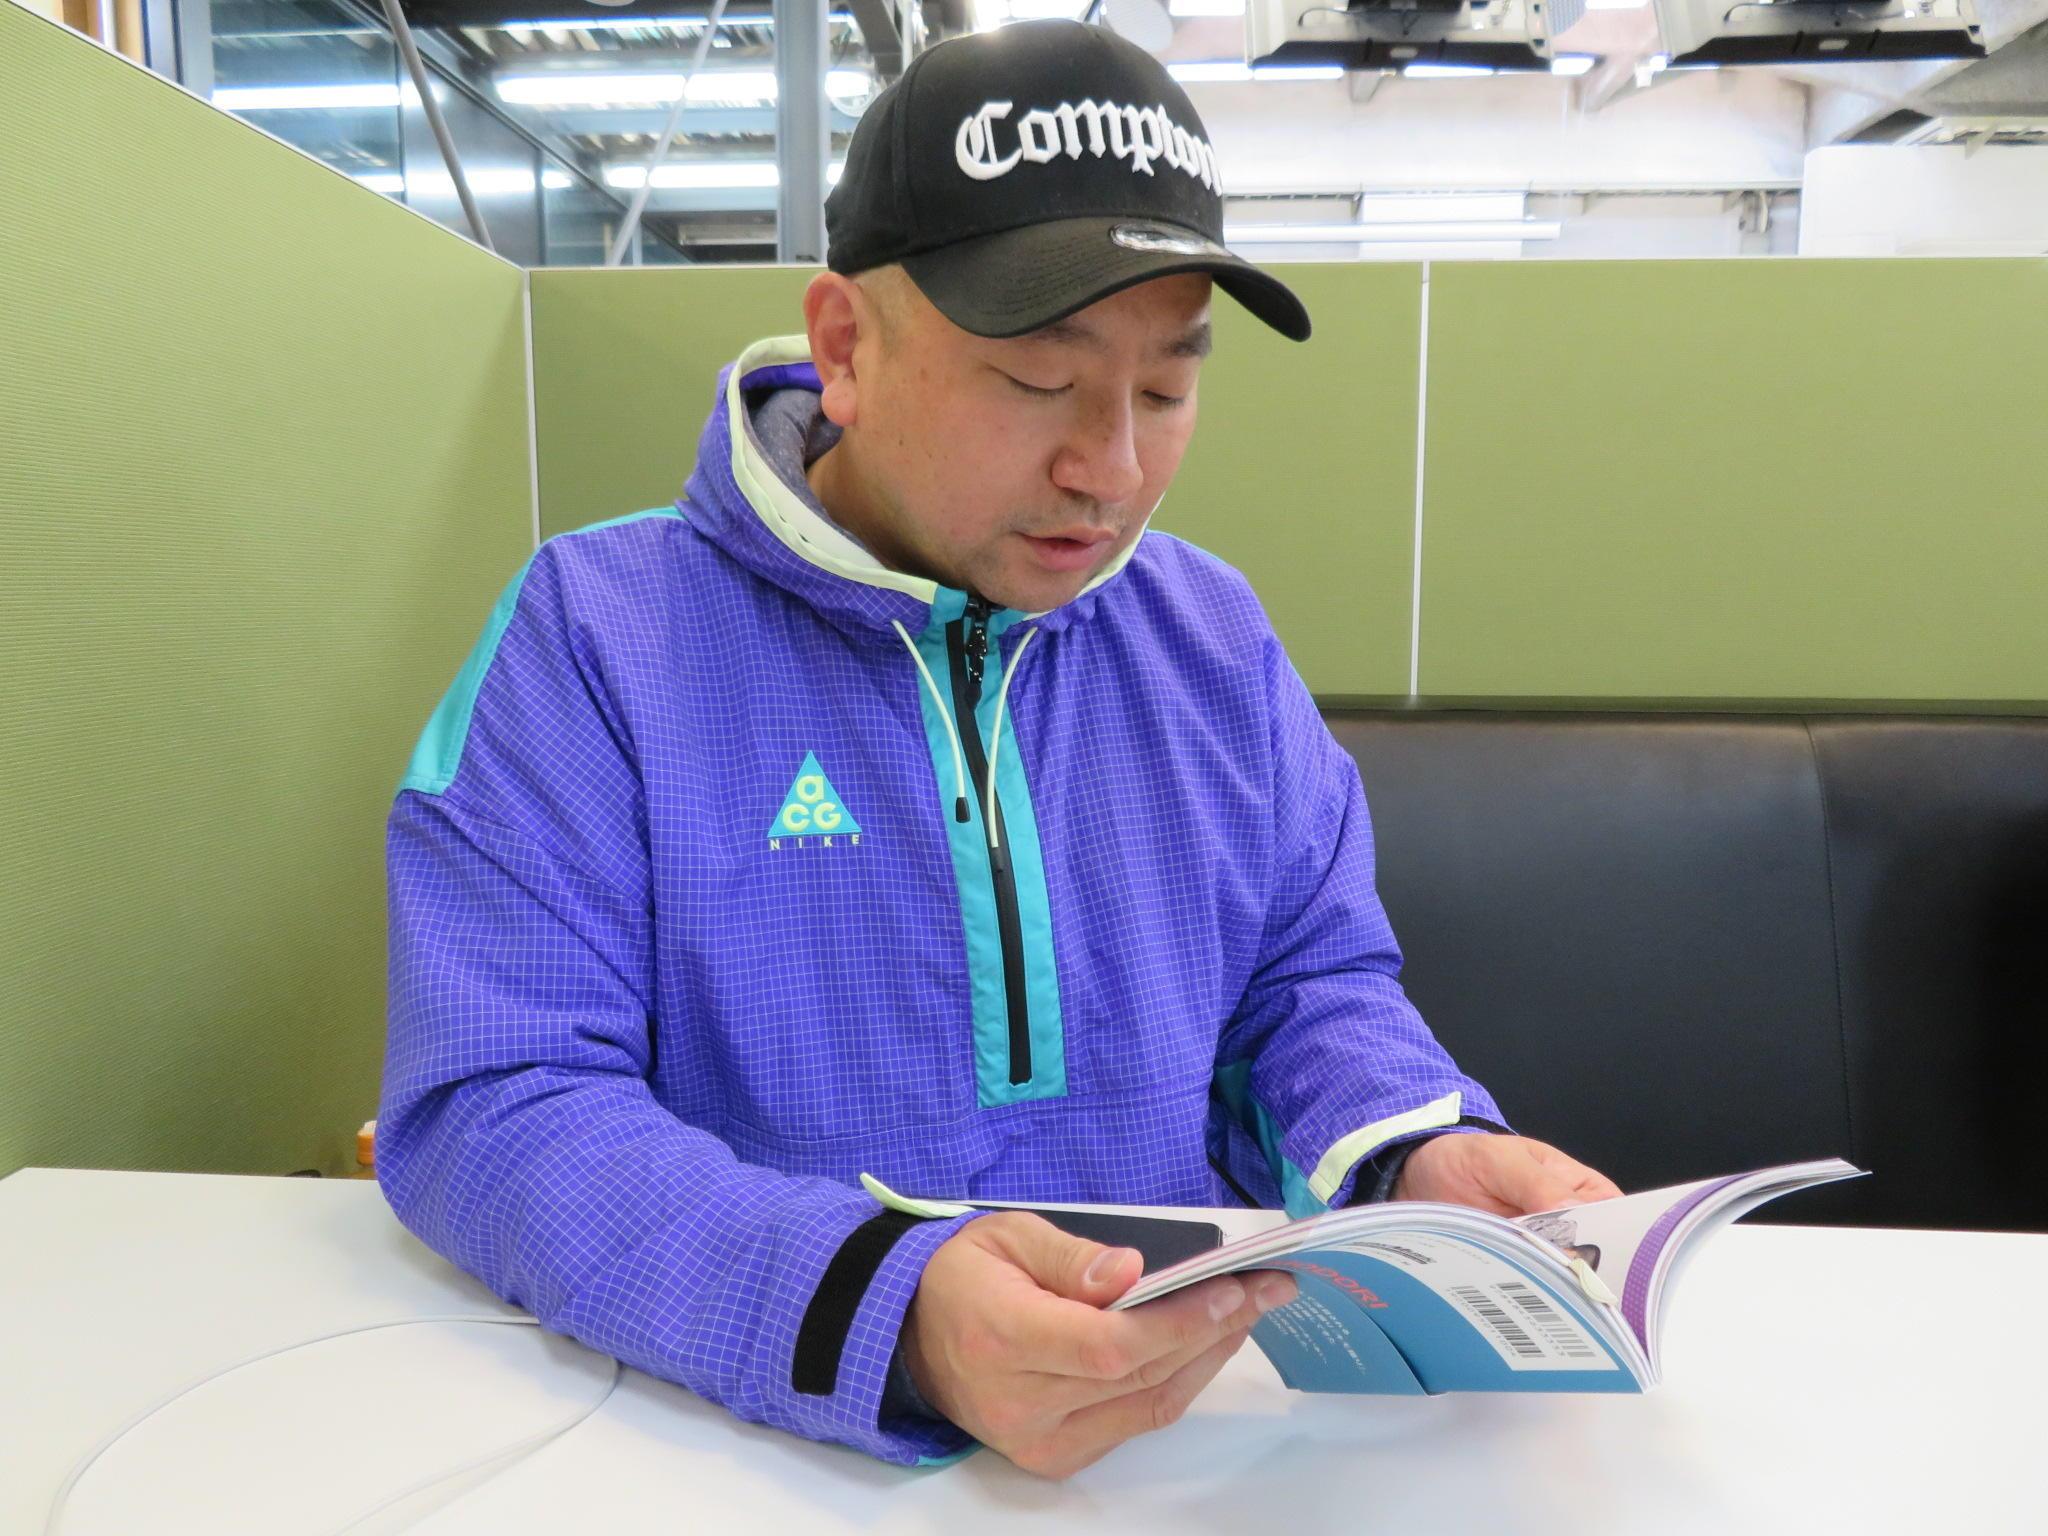 http://news.yoshimoto.co.jp/20181229124746-1c94047035cfcdb434d7d2f13221c541d47954e2.jpg